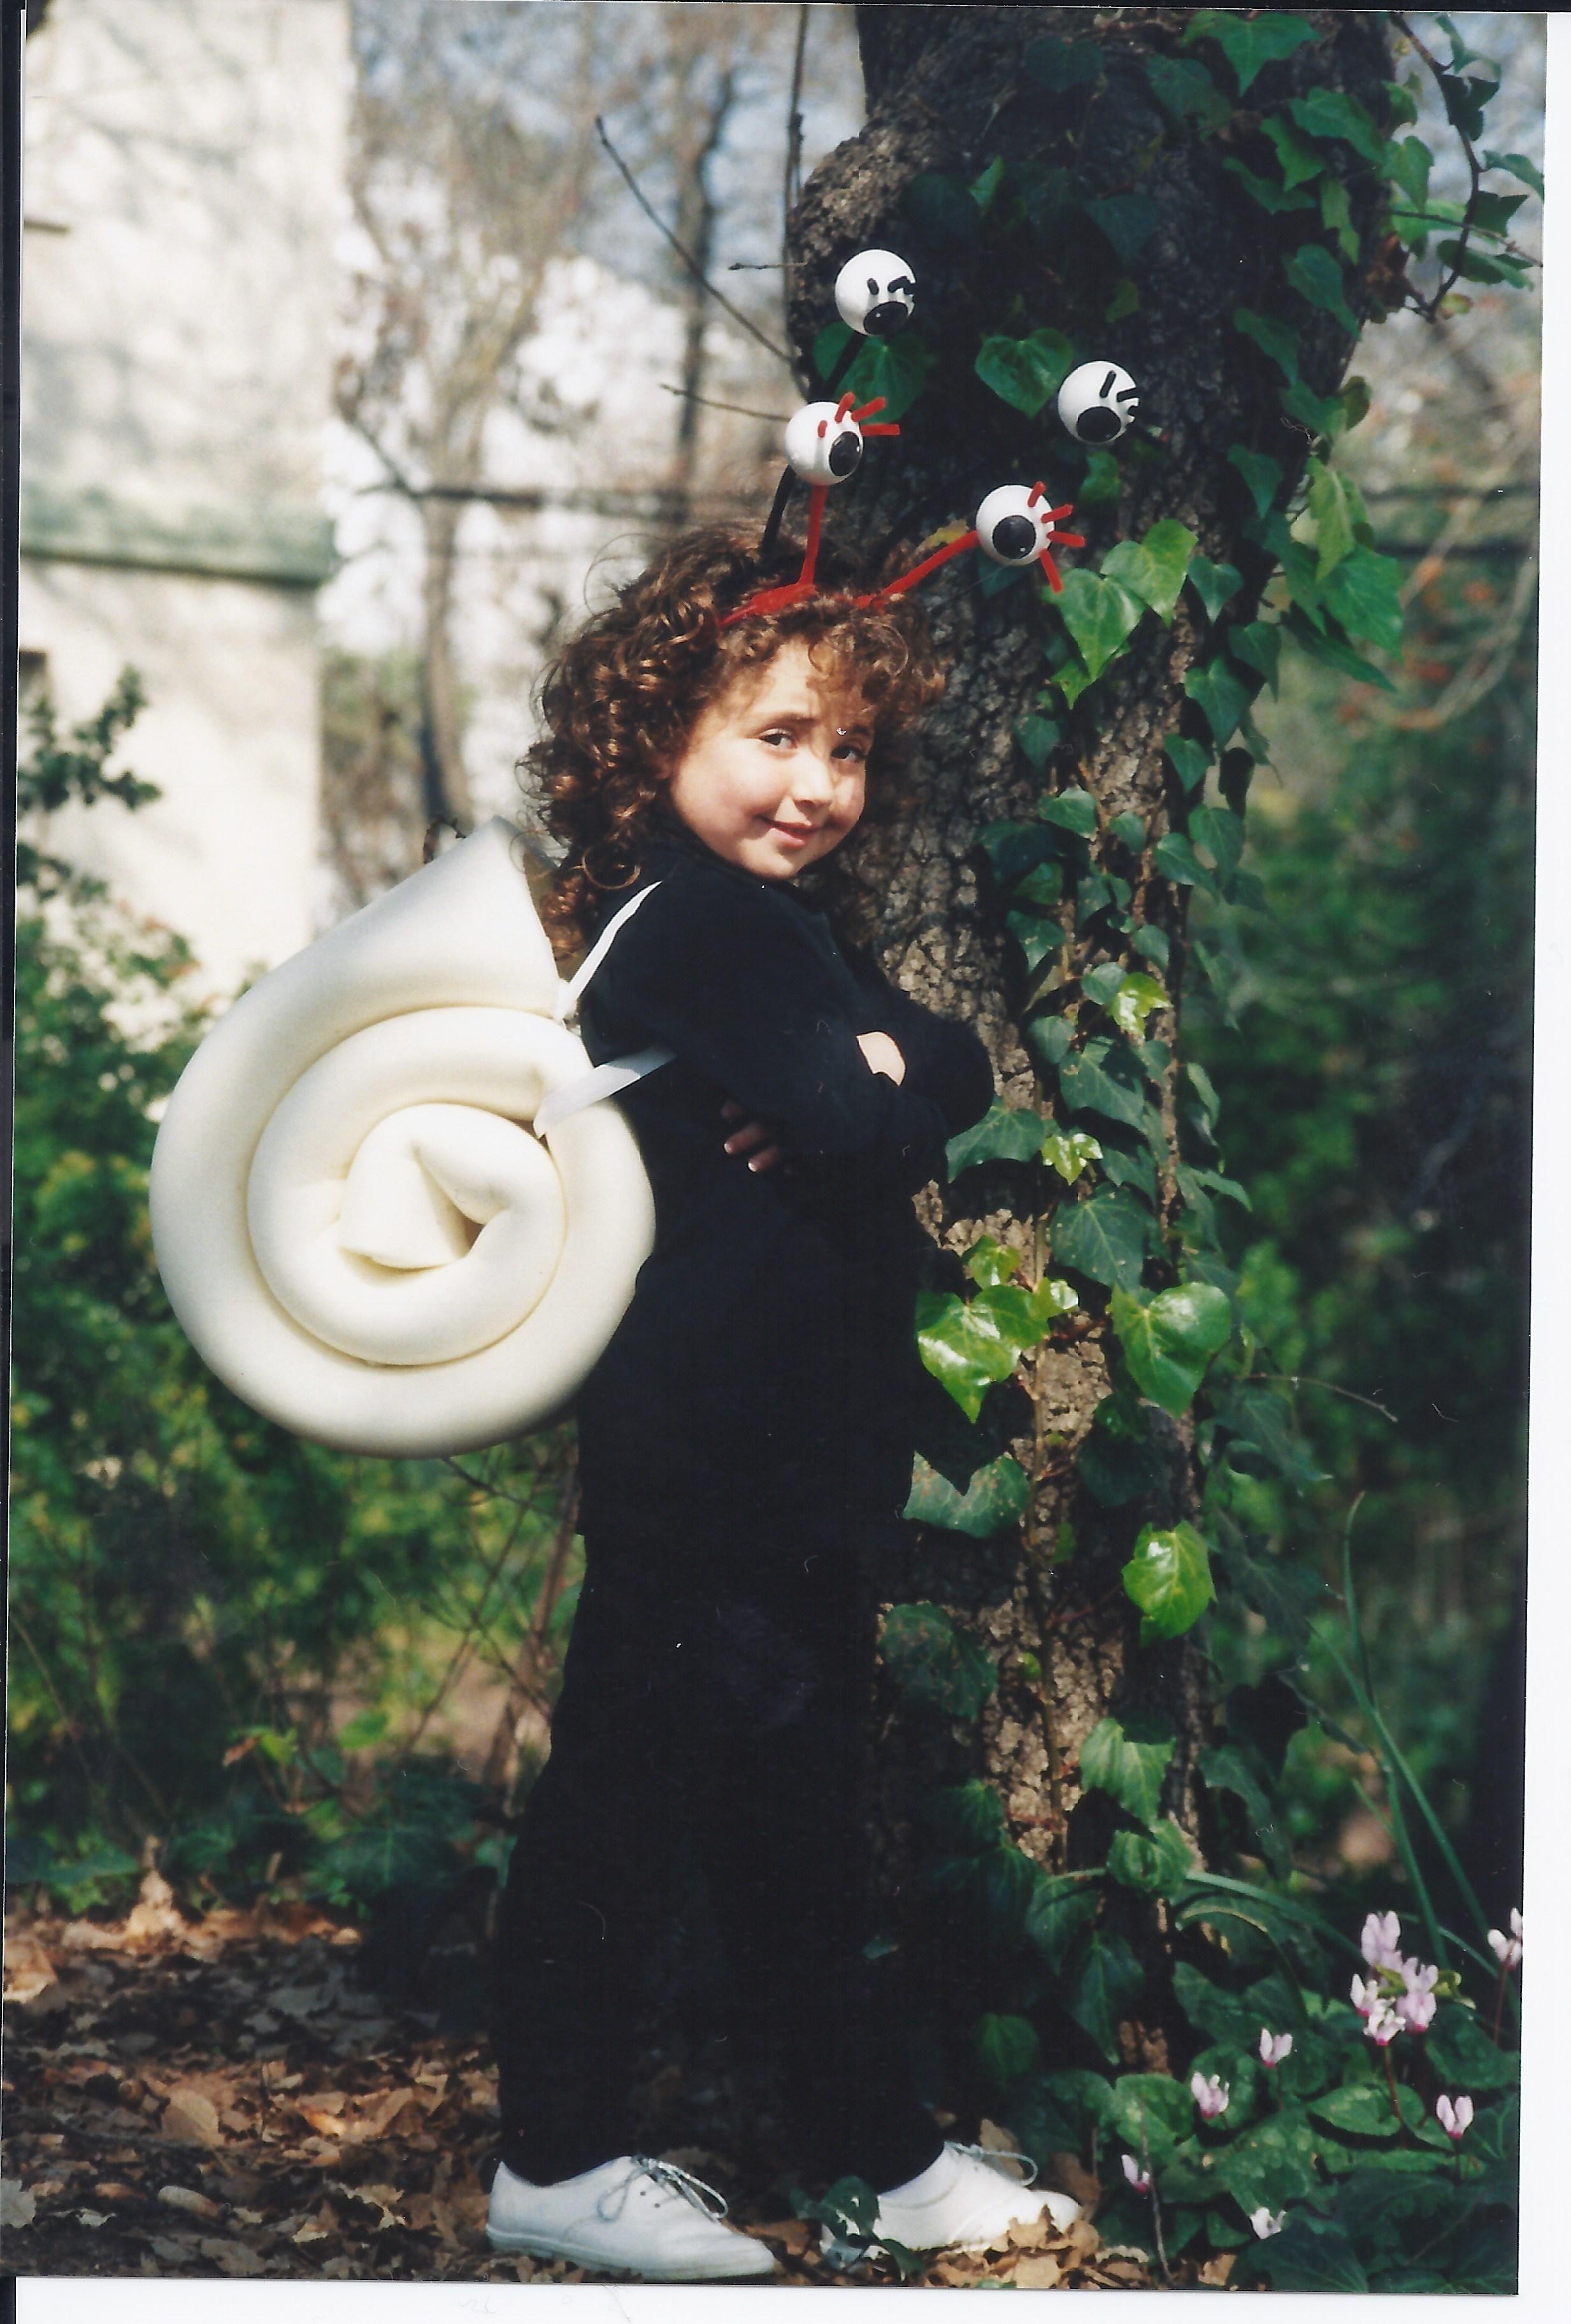 snail costume diy snails pinterest fasching kost m und faschingskost me. Black Bedroom Furniture Sets. Home Design Ideas